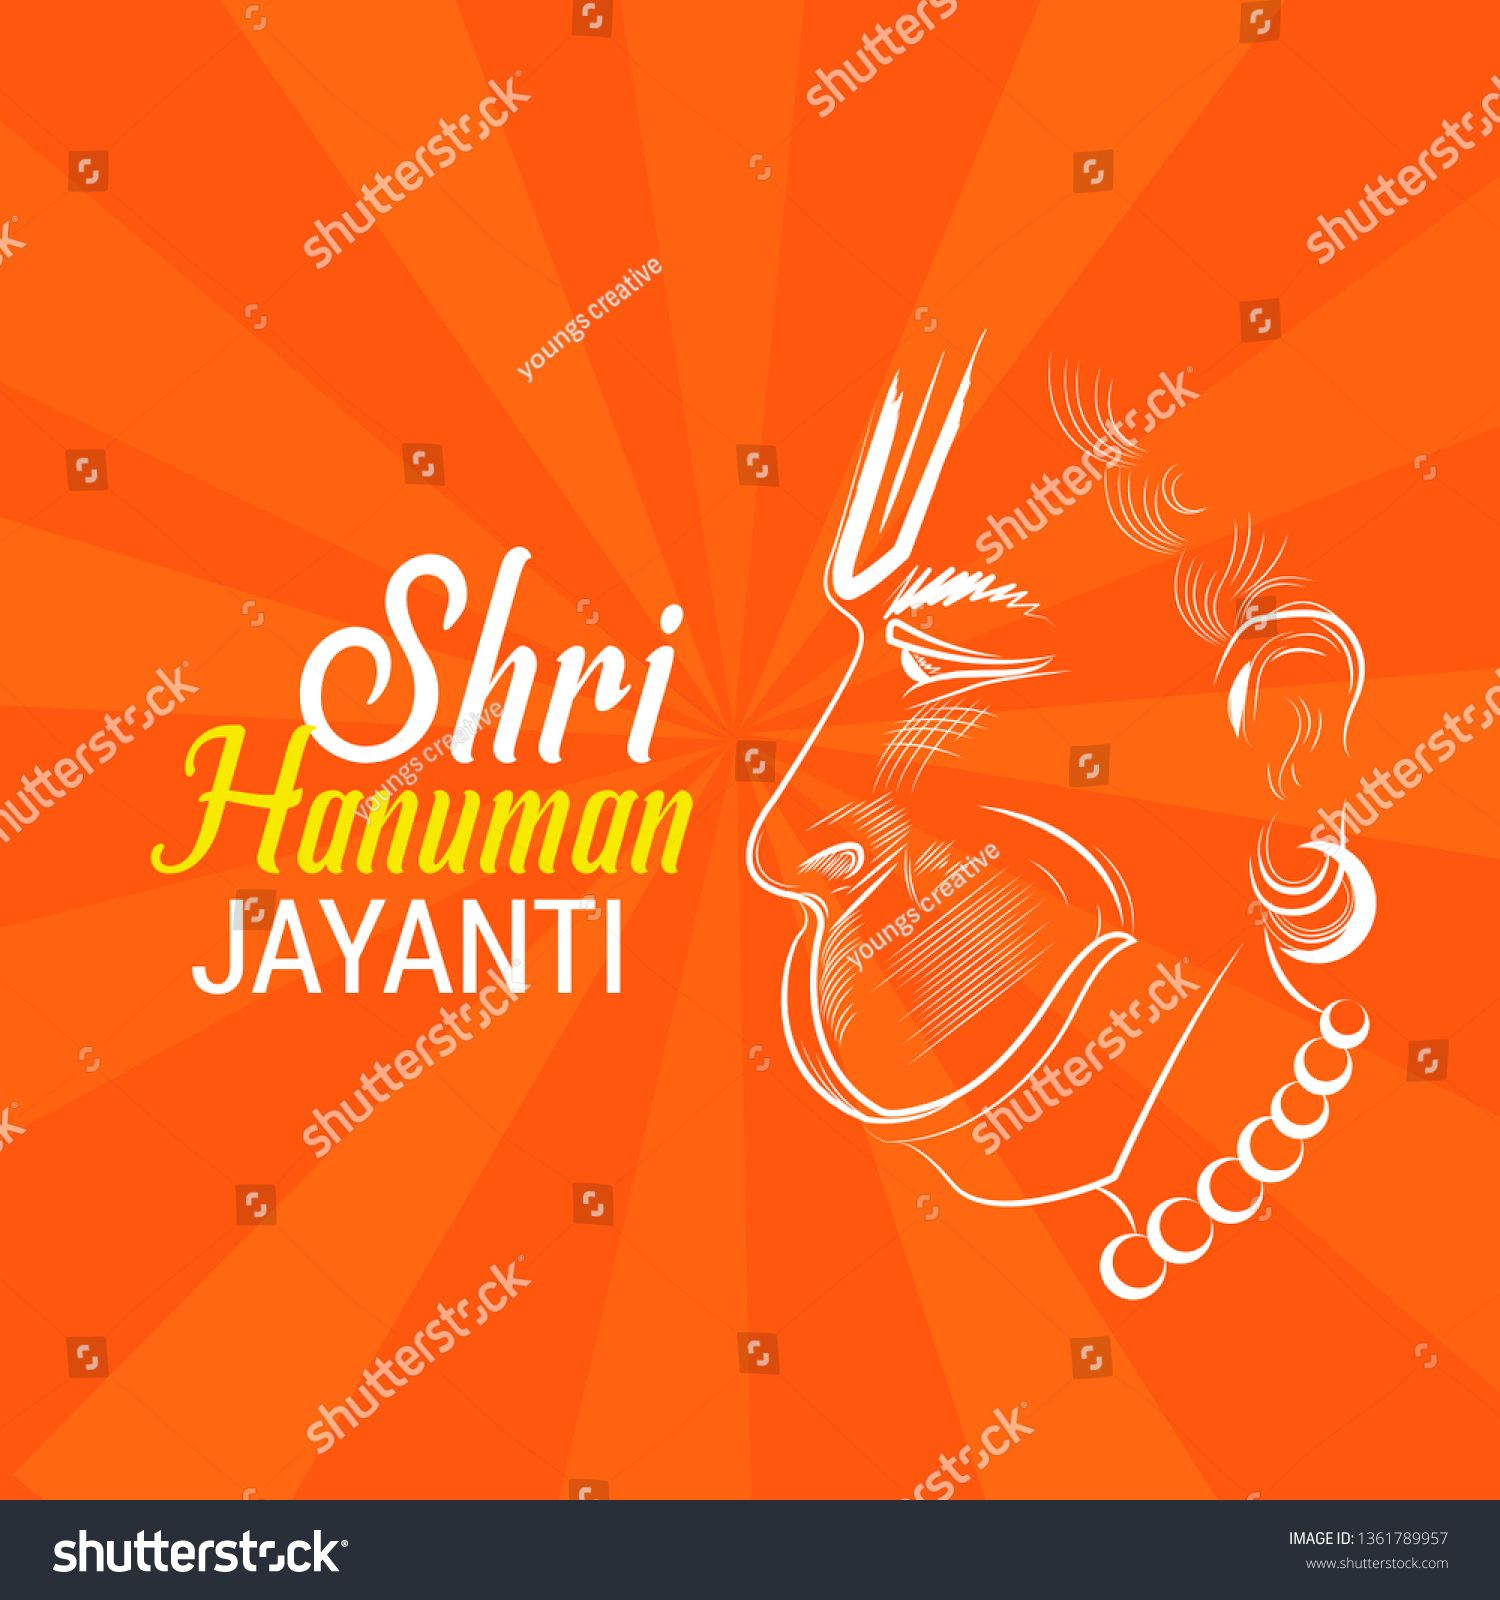 Hanuman Jayanti Vector Sponsored Affiliate Hanuman Jayanti Vector Christmas Design Illustration Design Poster Design